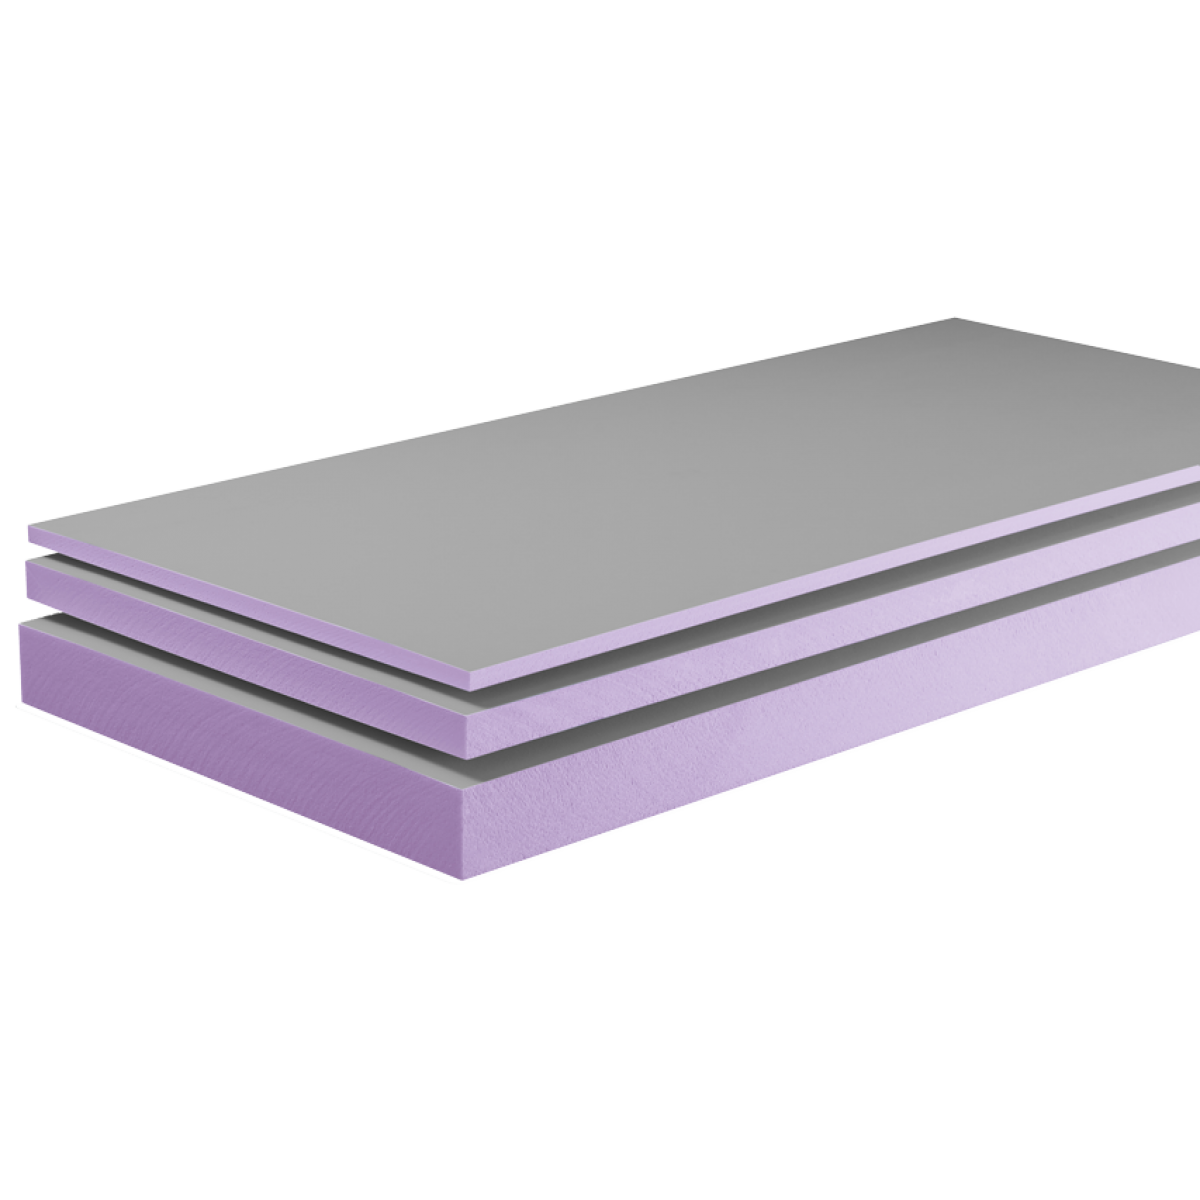 Systembauplatten 2600 x 600 x 10 mm / HBCD-frei